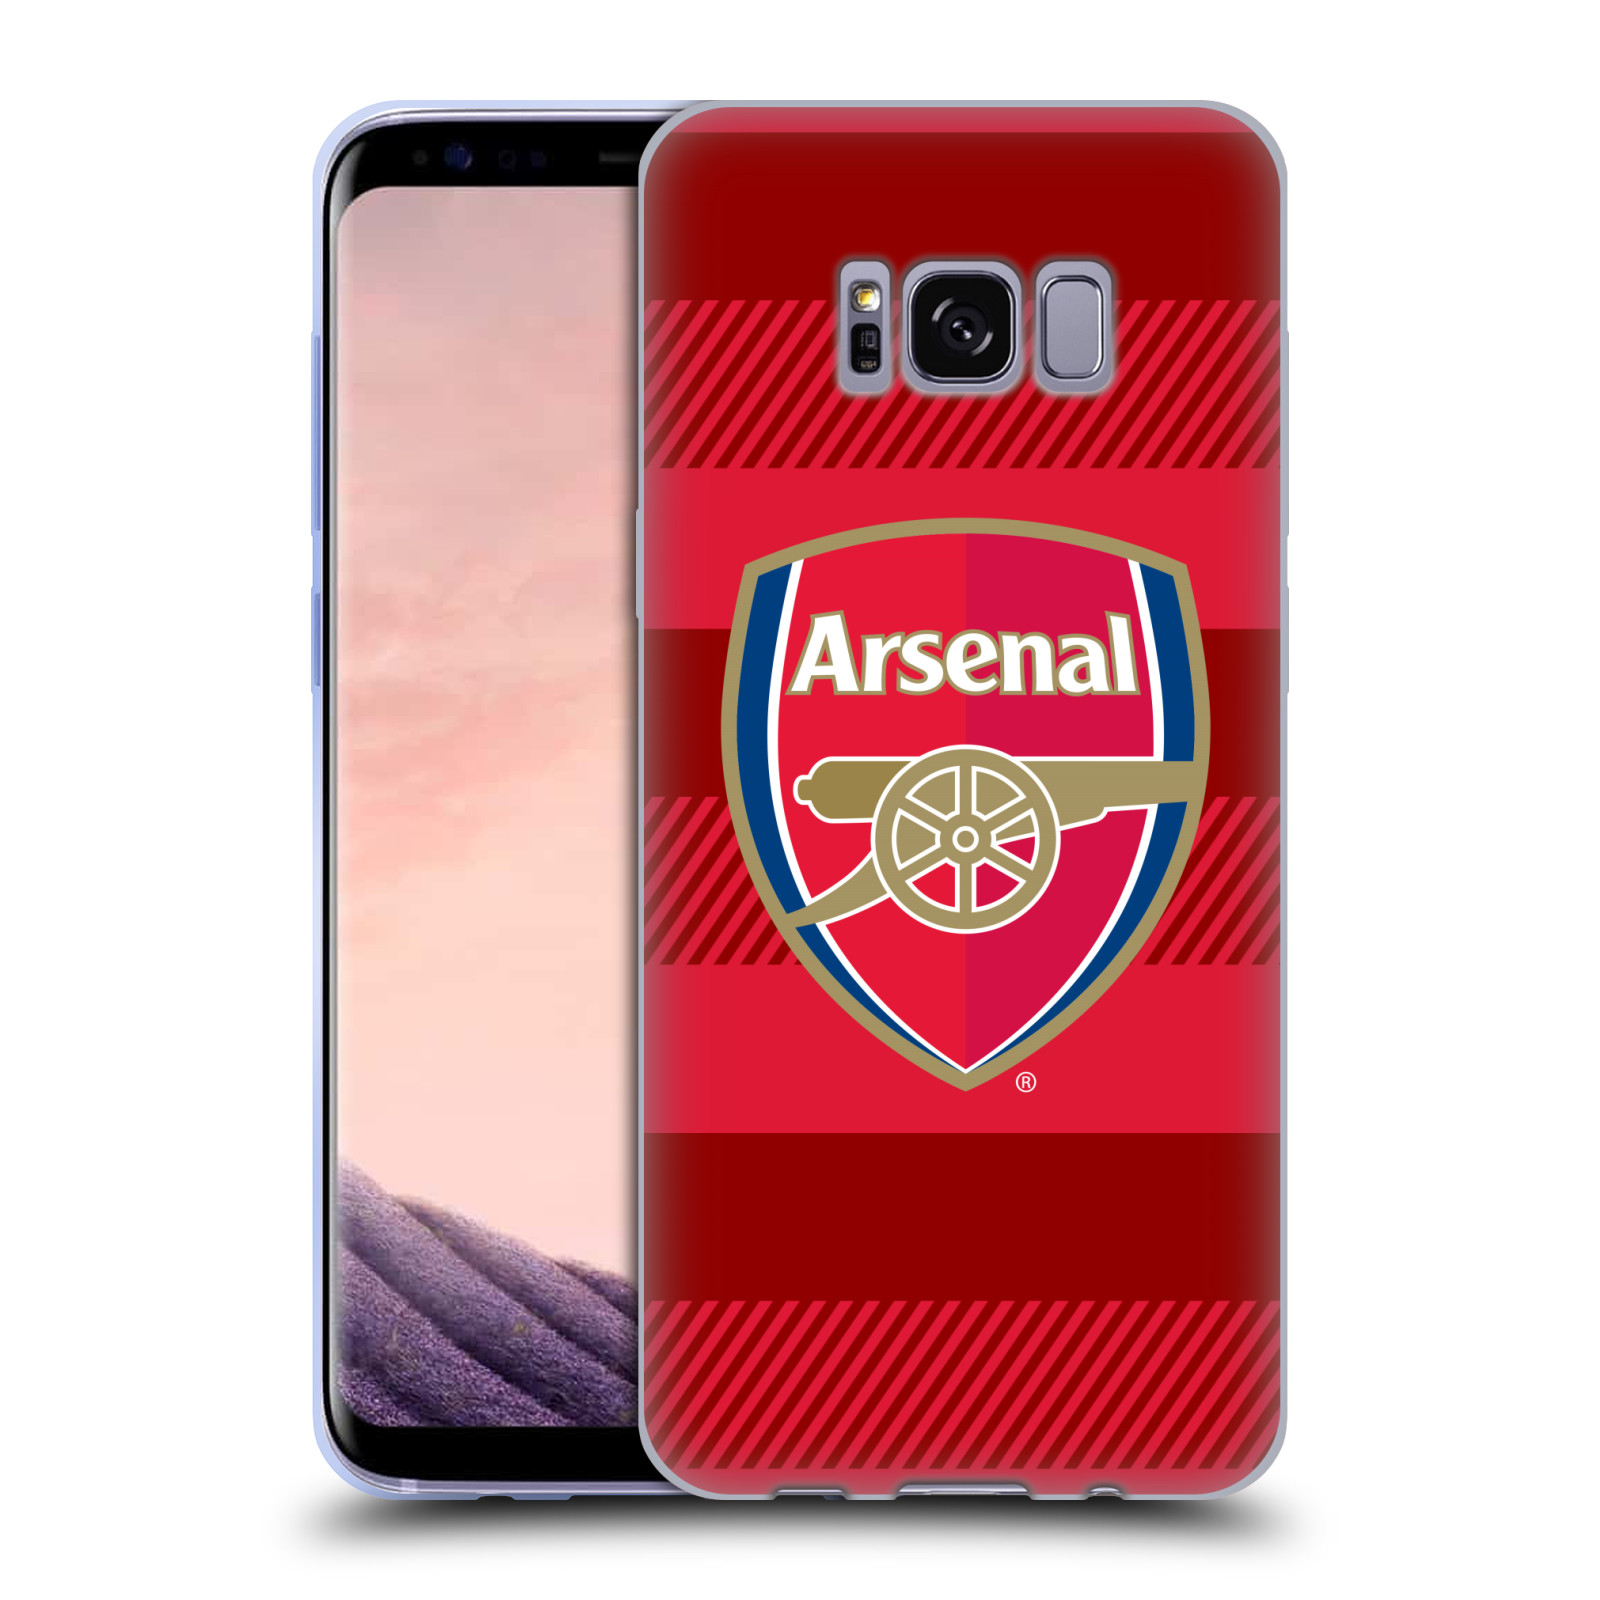 Silikonové pouzdro na mobil Samsung Galaxy S8 - Head Case - Arsenal FC - Logo s pruhy